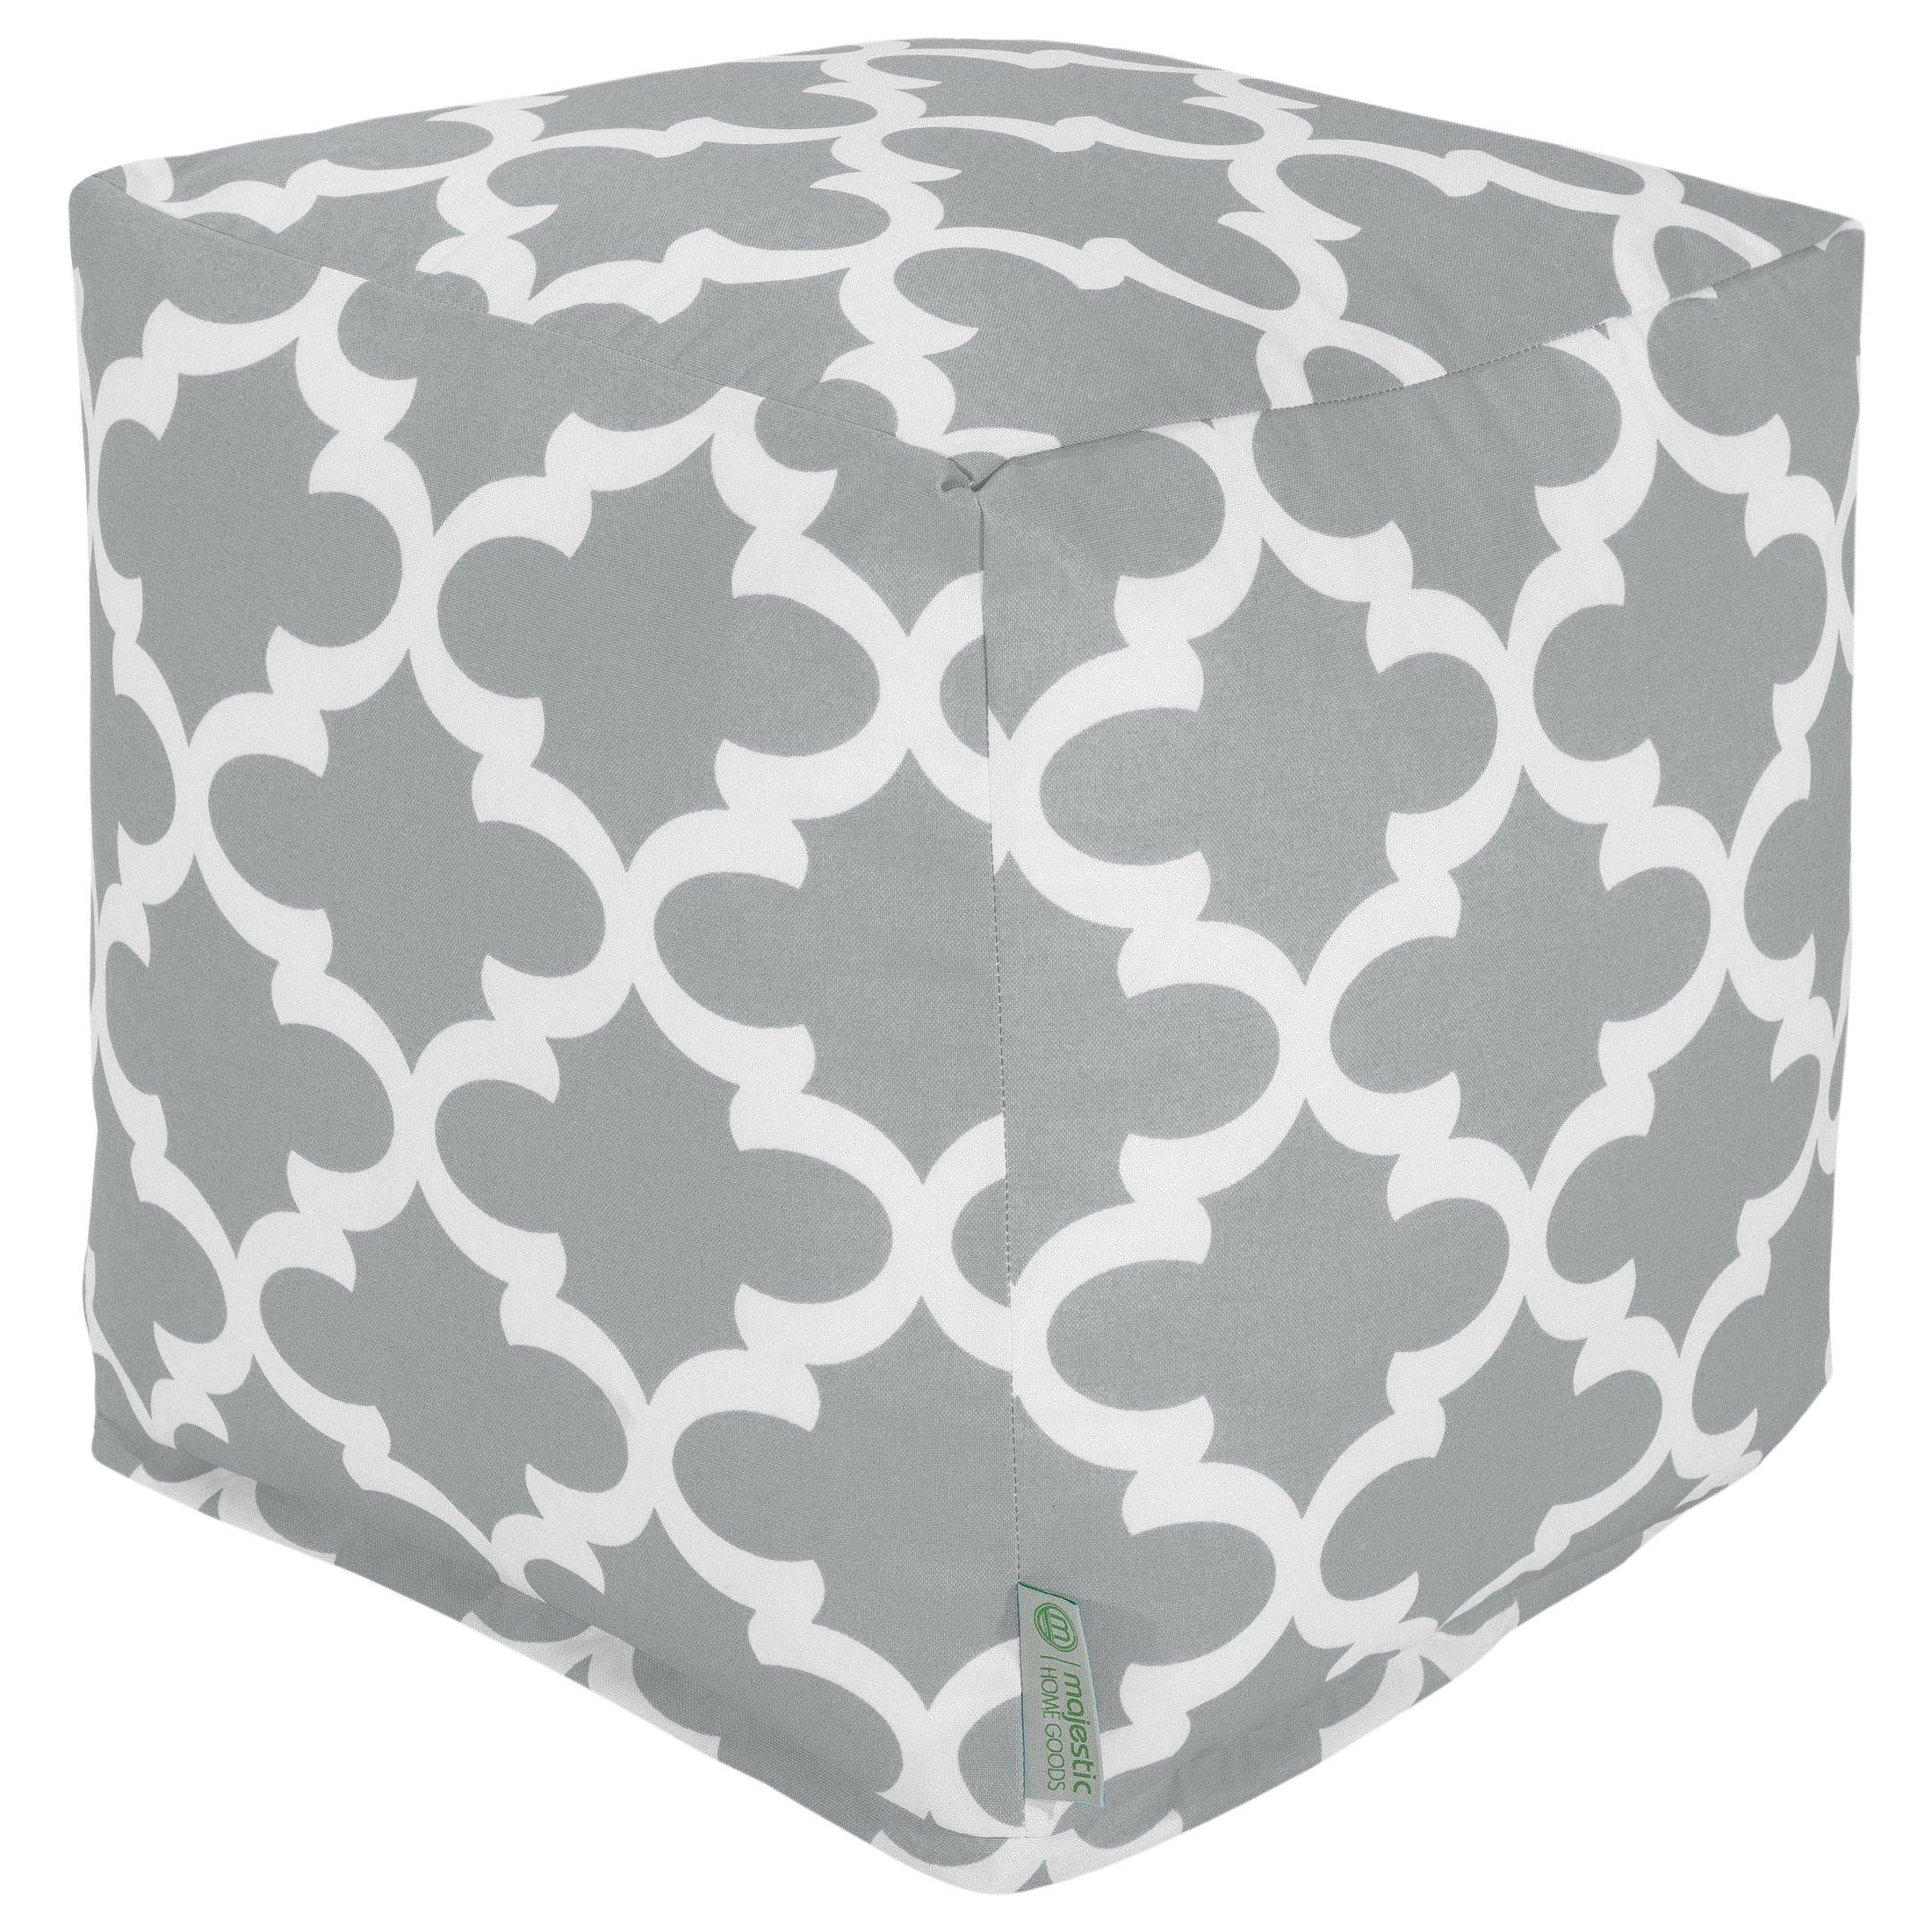 Majestic Home Goods Gray Trellis Indoor/Outdoor Bean Bag Ottoman Pouf Cube 17'' L x 17'' W x 17'' H